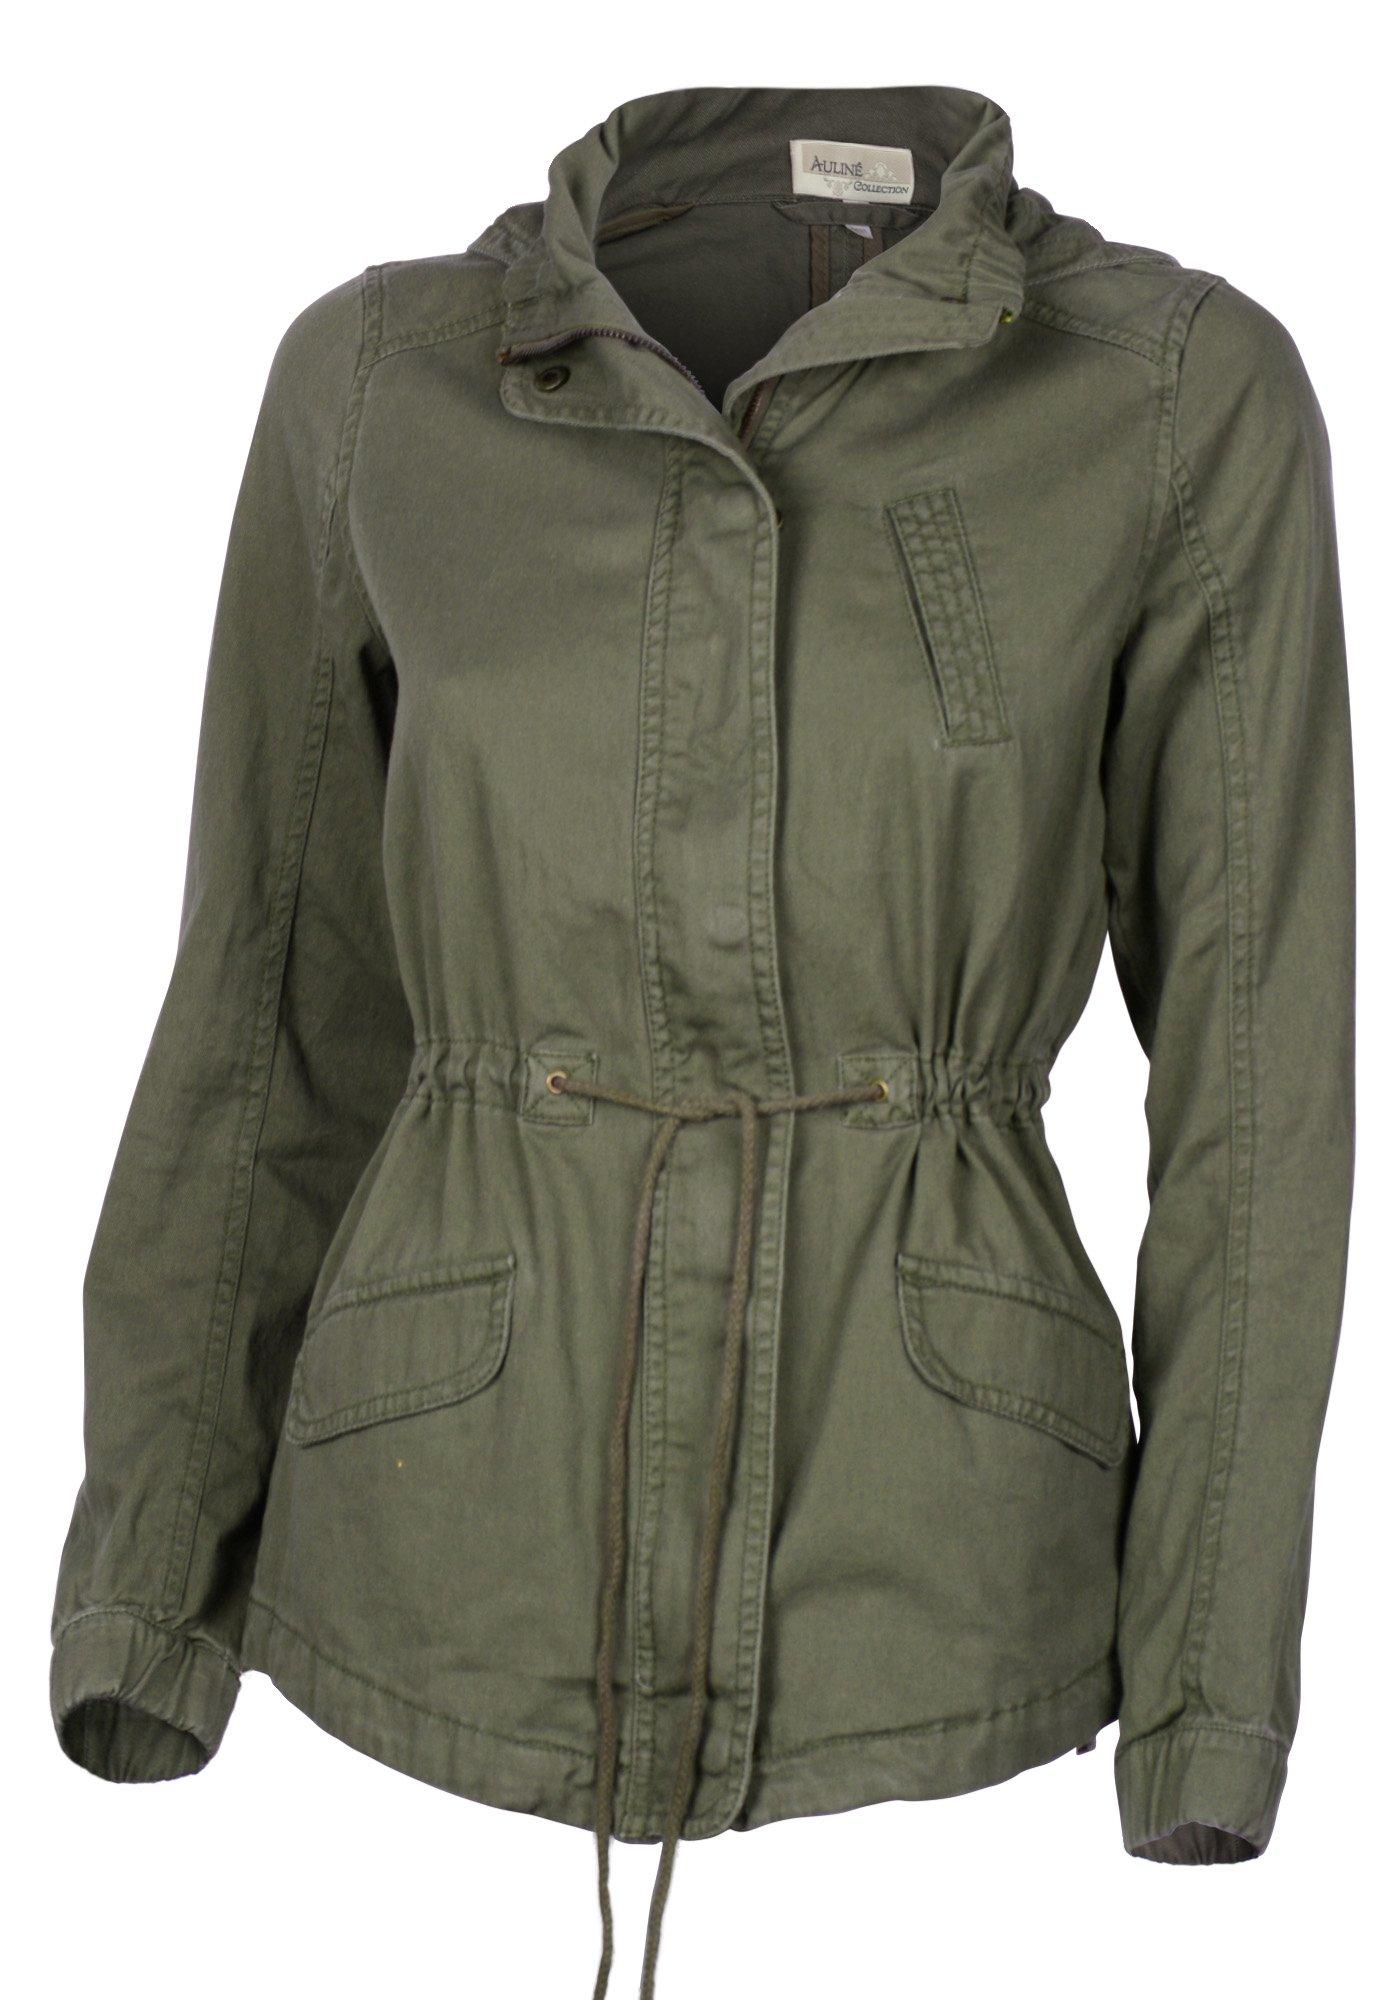 8f32d436e66 Women s Premium Vintage Wash Lightweight Military Fashion Twill Hoodie  Jacket   Anoraks   Clothing